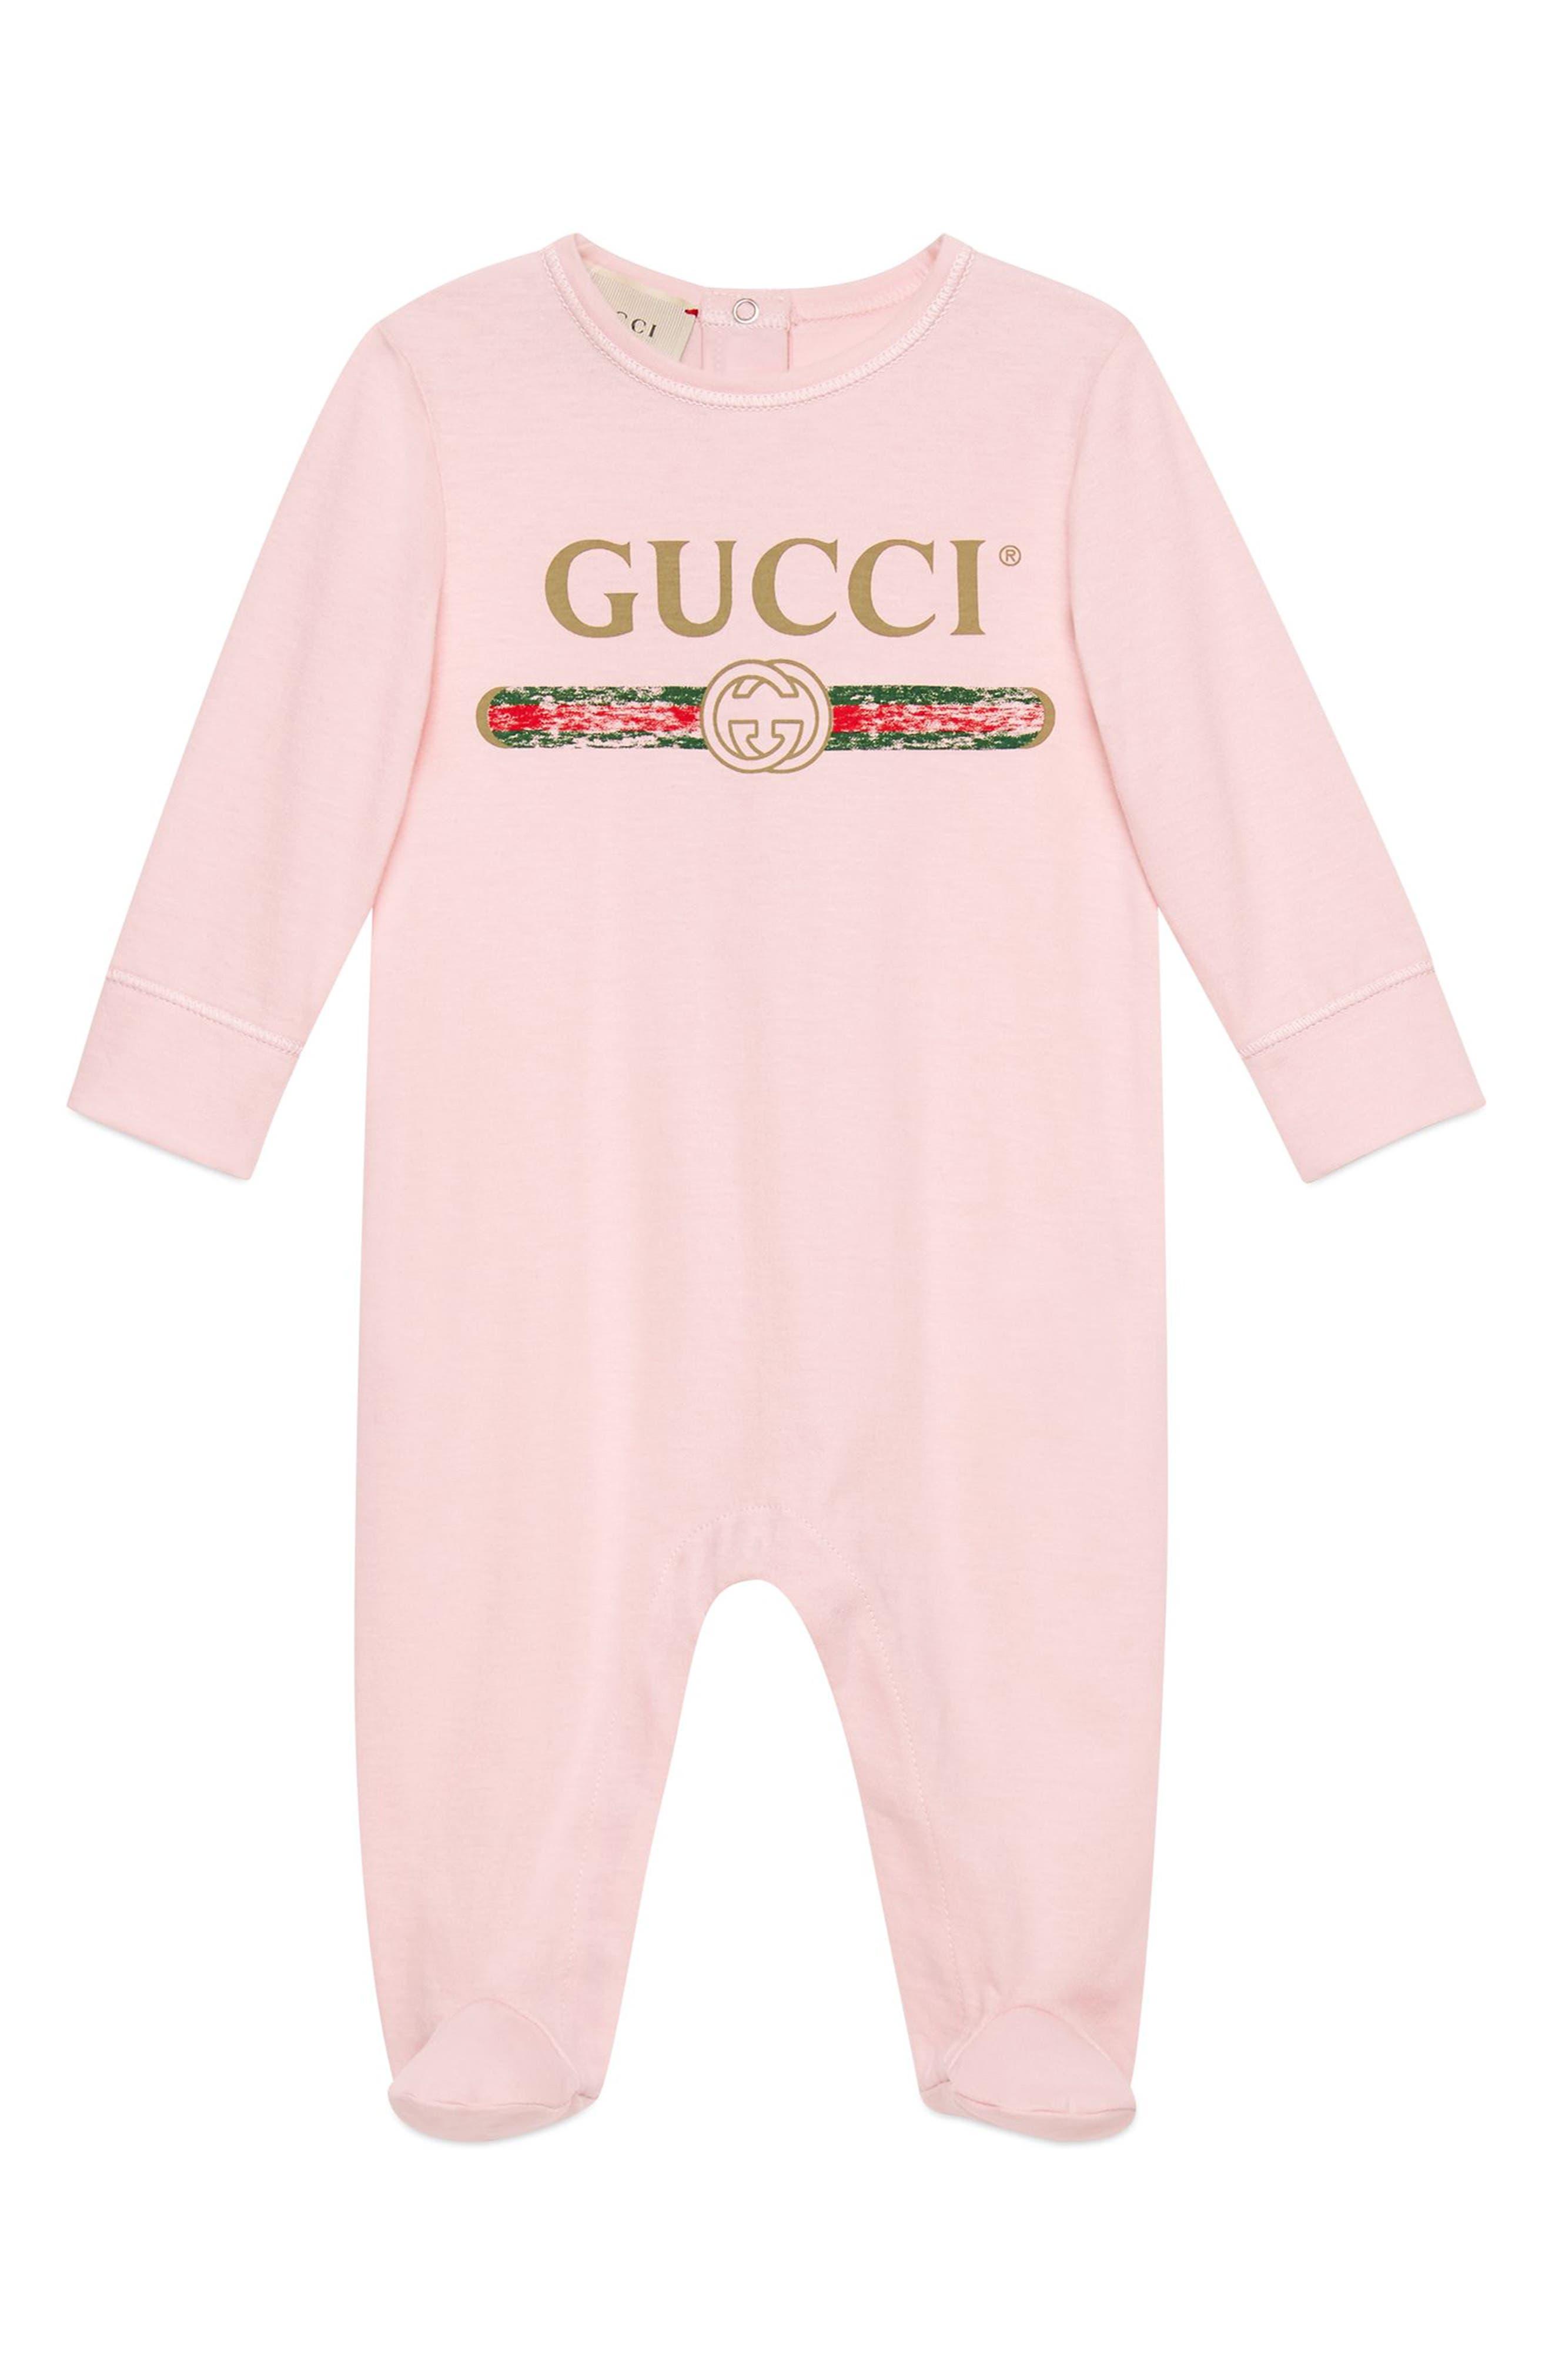 05116a81f0dff Designer Baby Clothes | Nordstrom